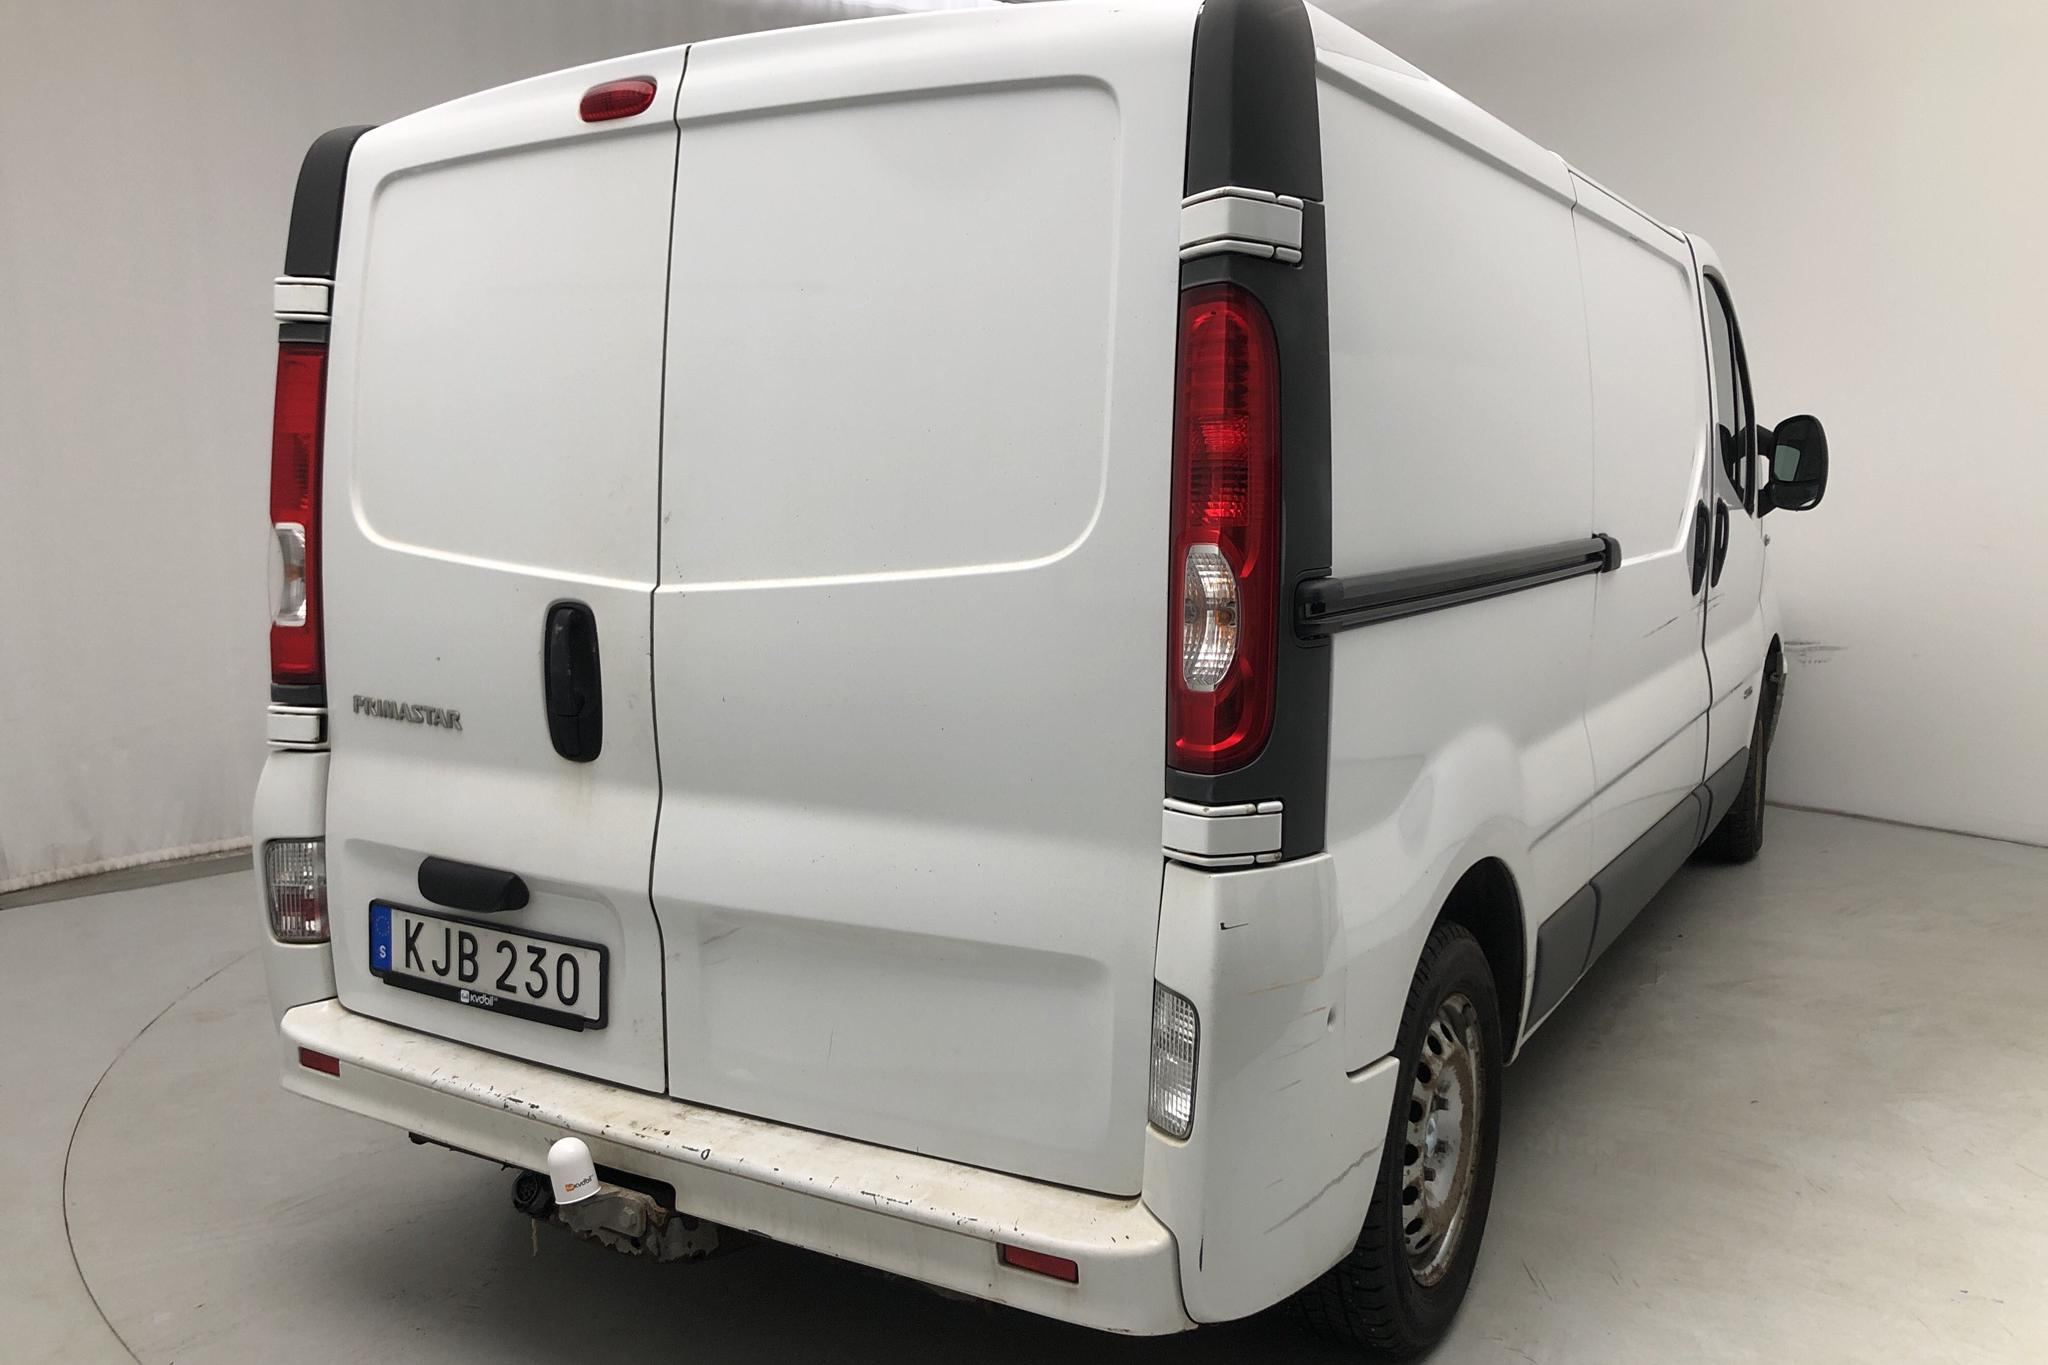 Nissan Primastar 2.0 dCi (114hk) - 18 560 mil - Manuell - vit - 2014